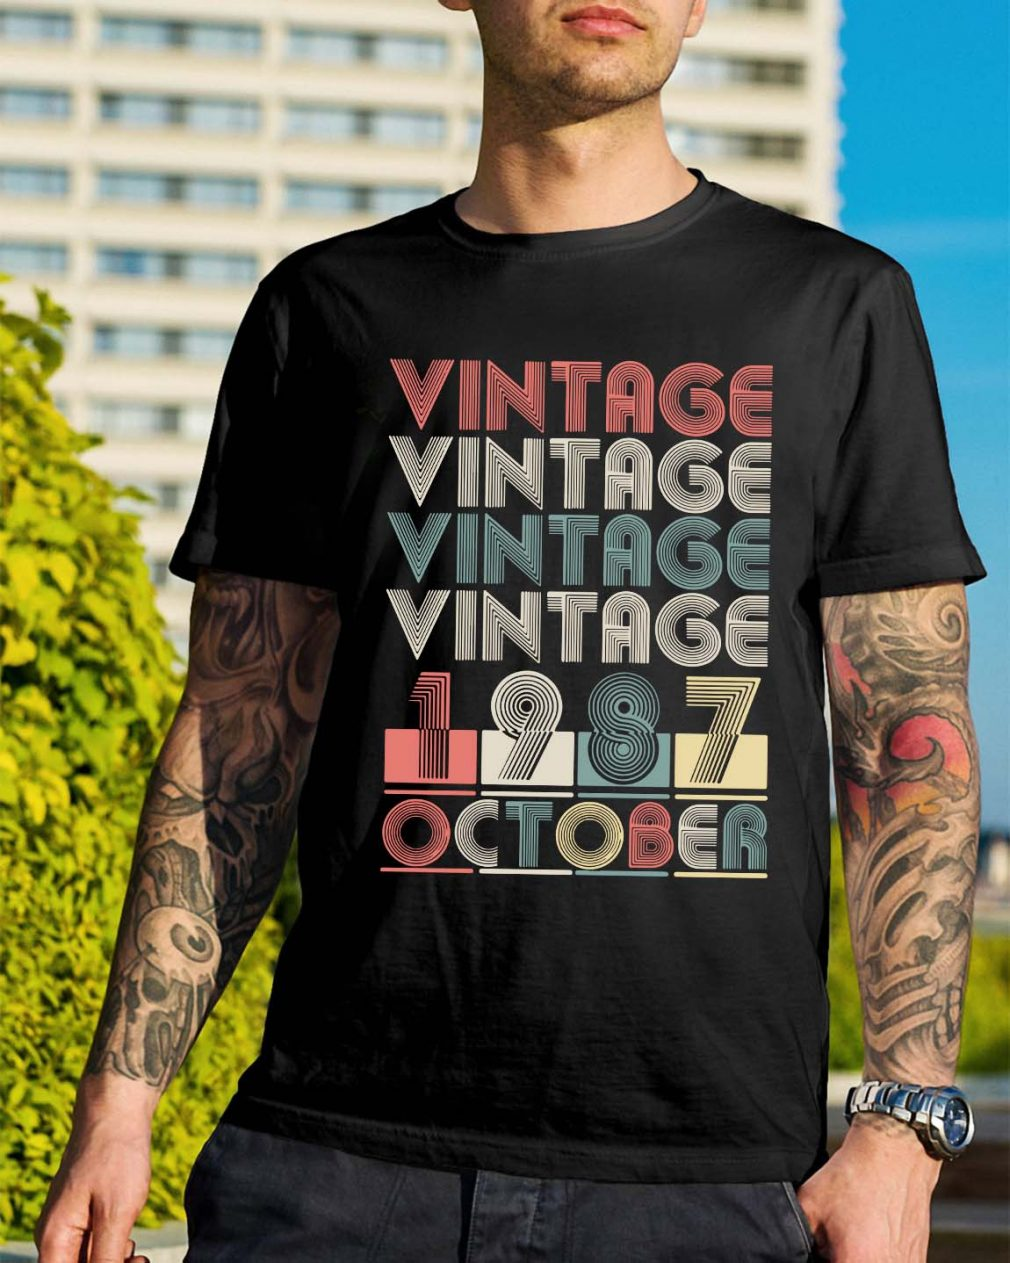 Vintage vintage vintage vintage 1987 October shirt